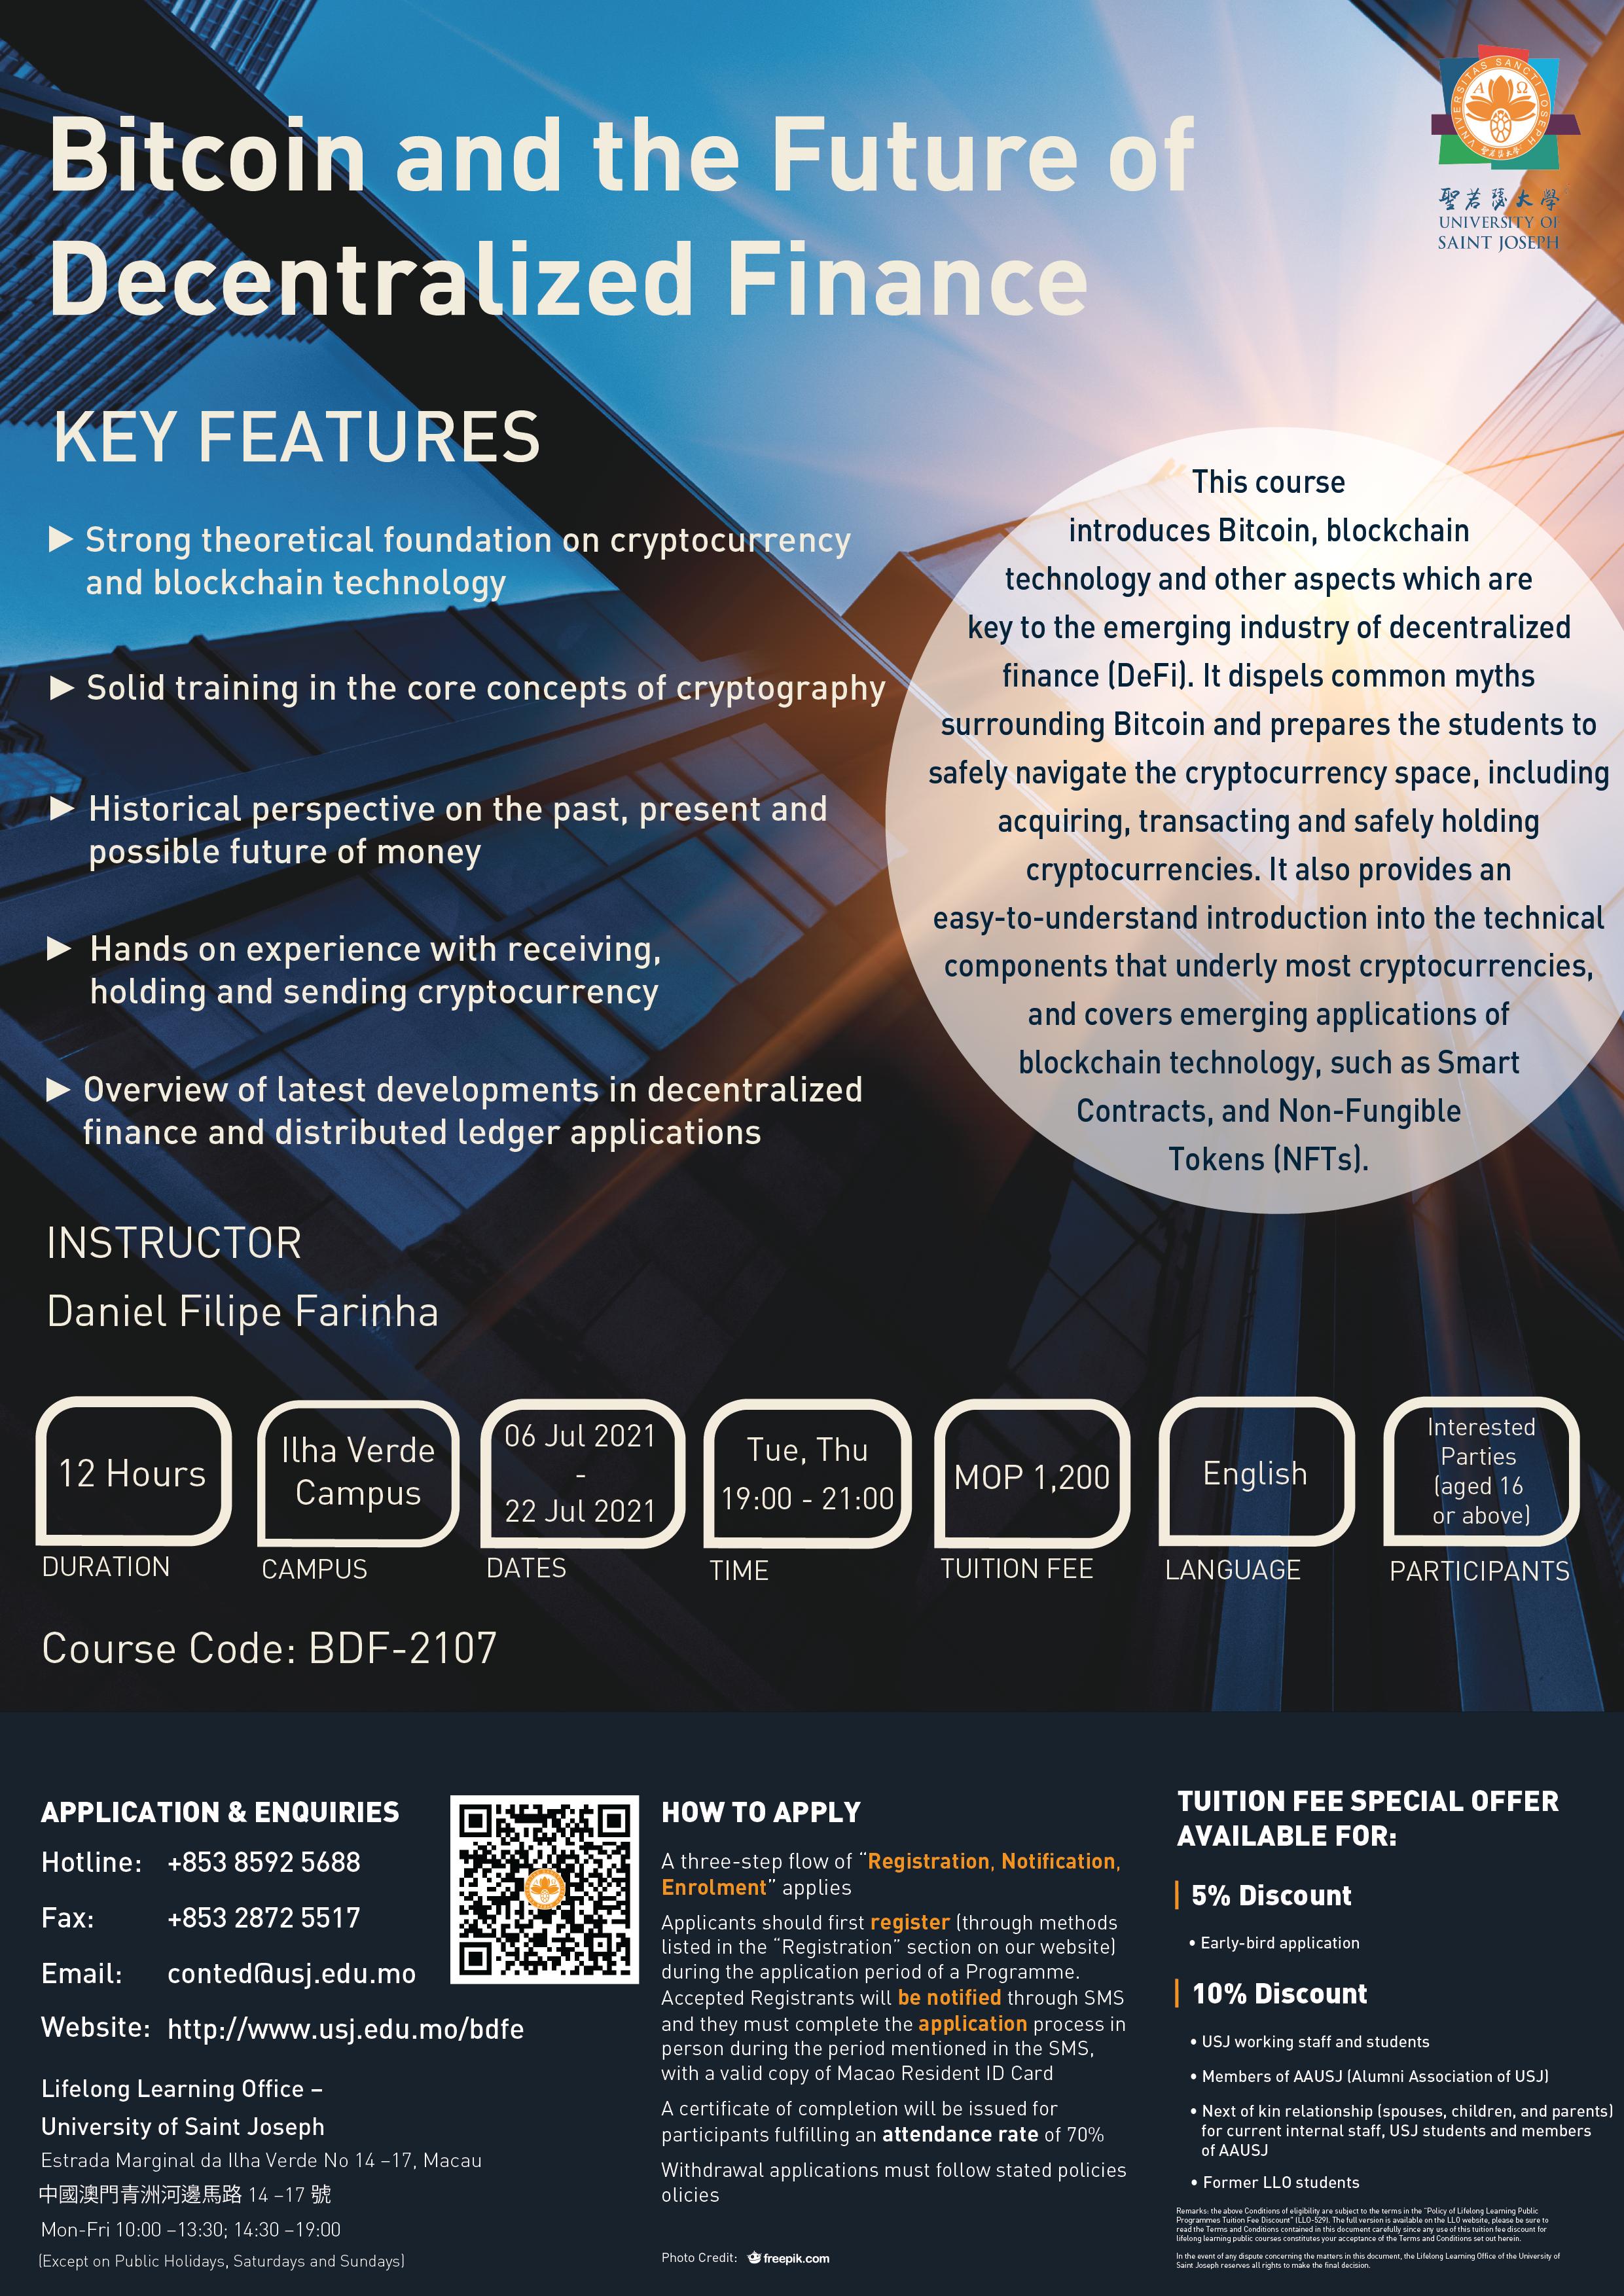 Bitcoin and the future of decentralized finance (by Daniel Filipe)_20210511-01